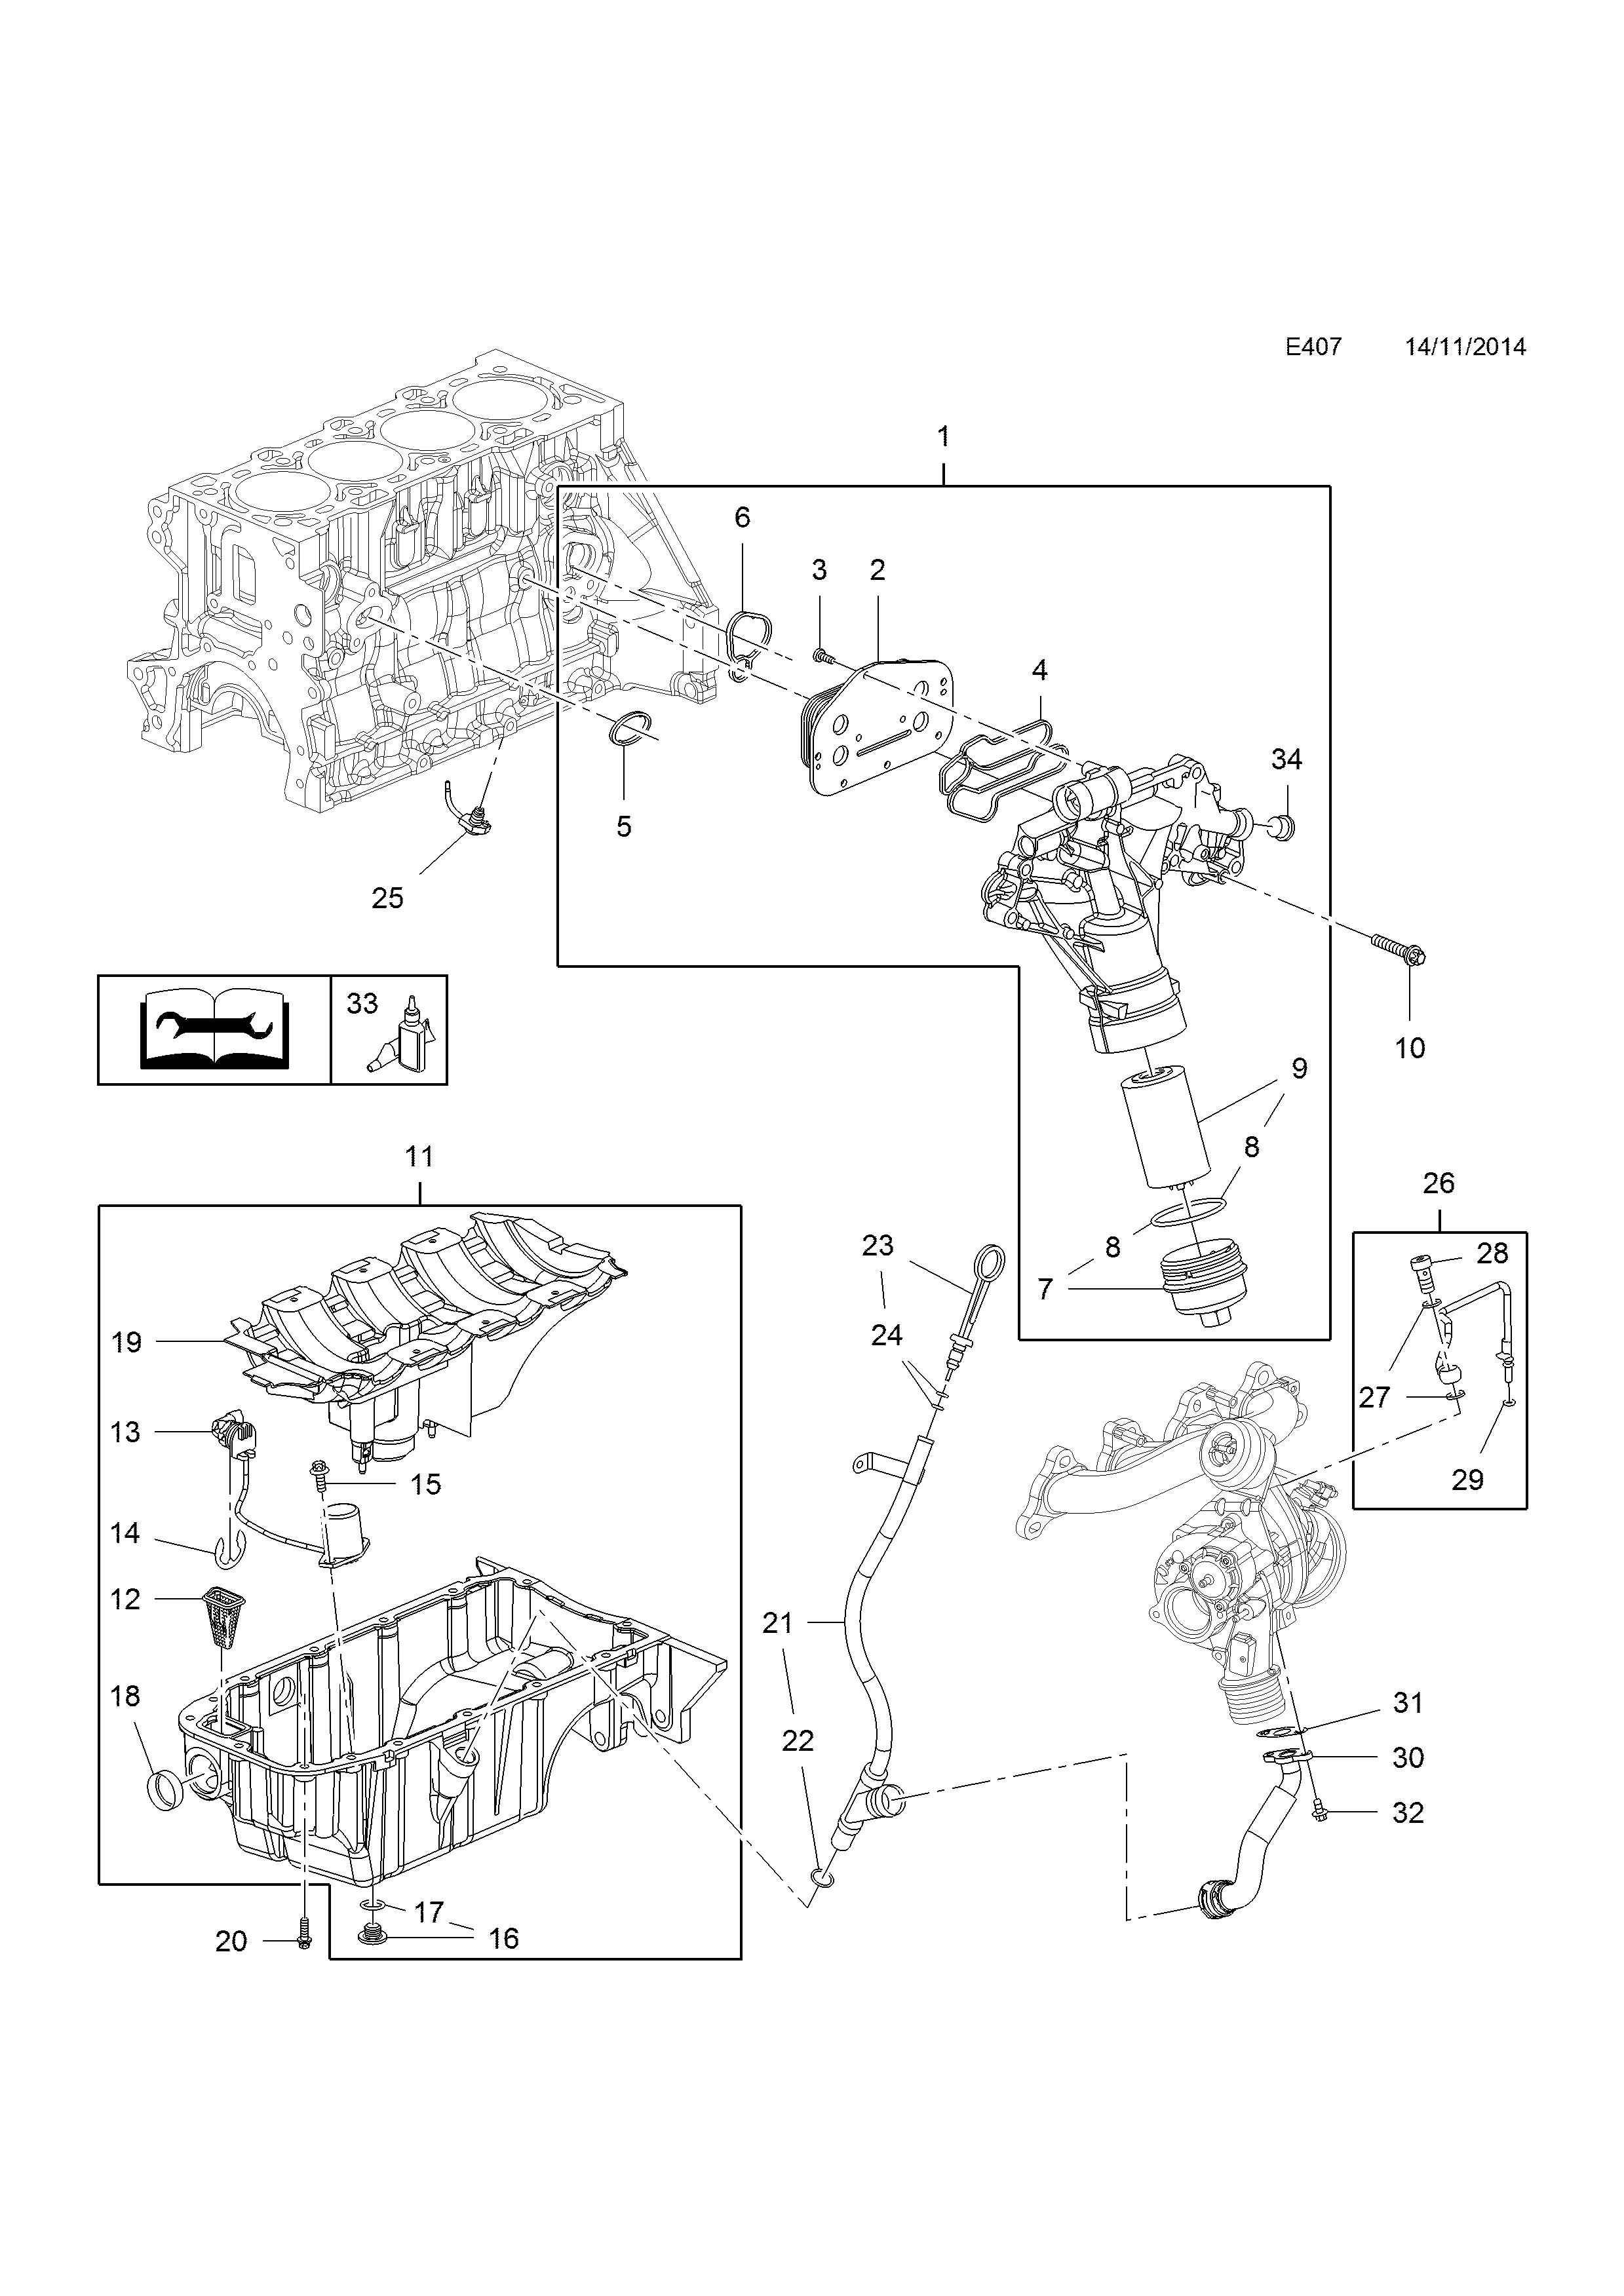 vauxhall corsa e 2015 e engine and clutch 5 b16les llu 1977 Opel GT list of parts